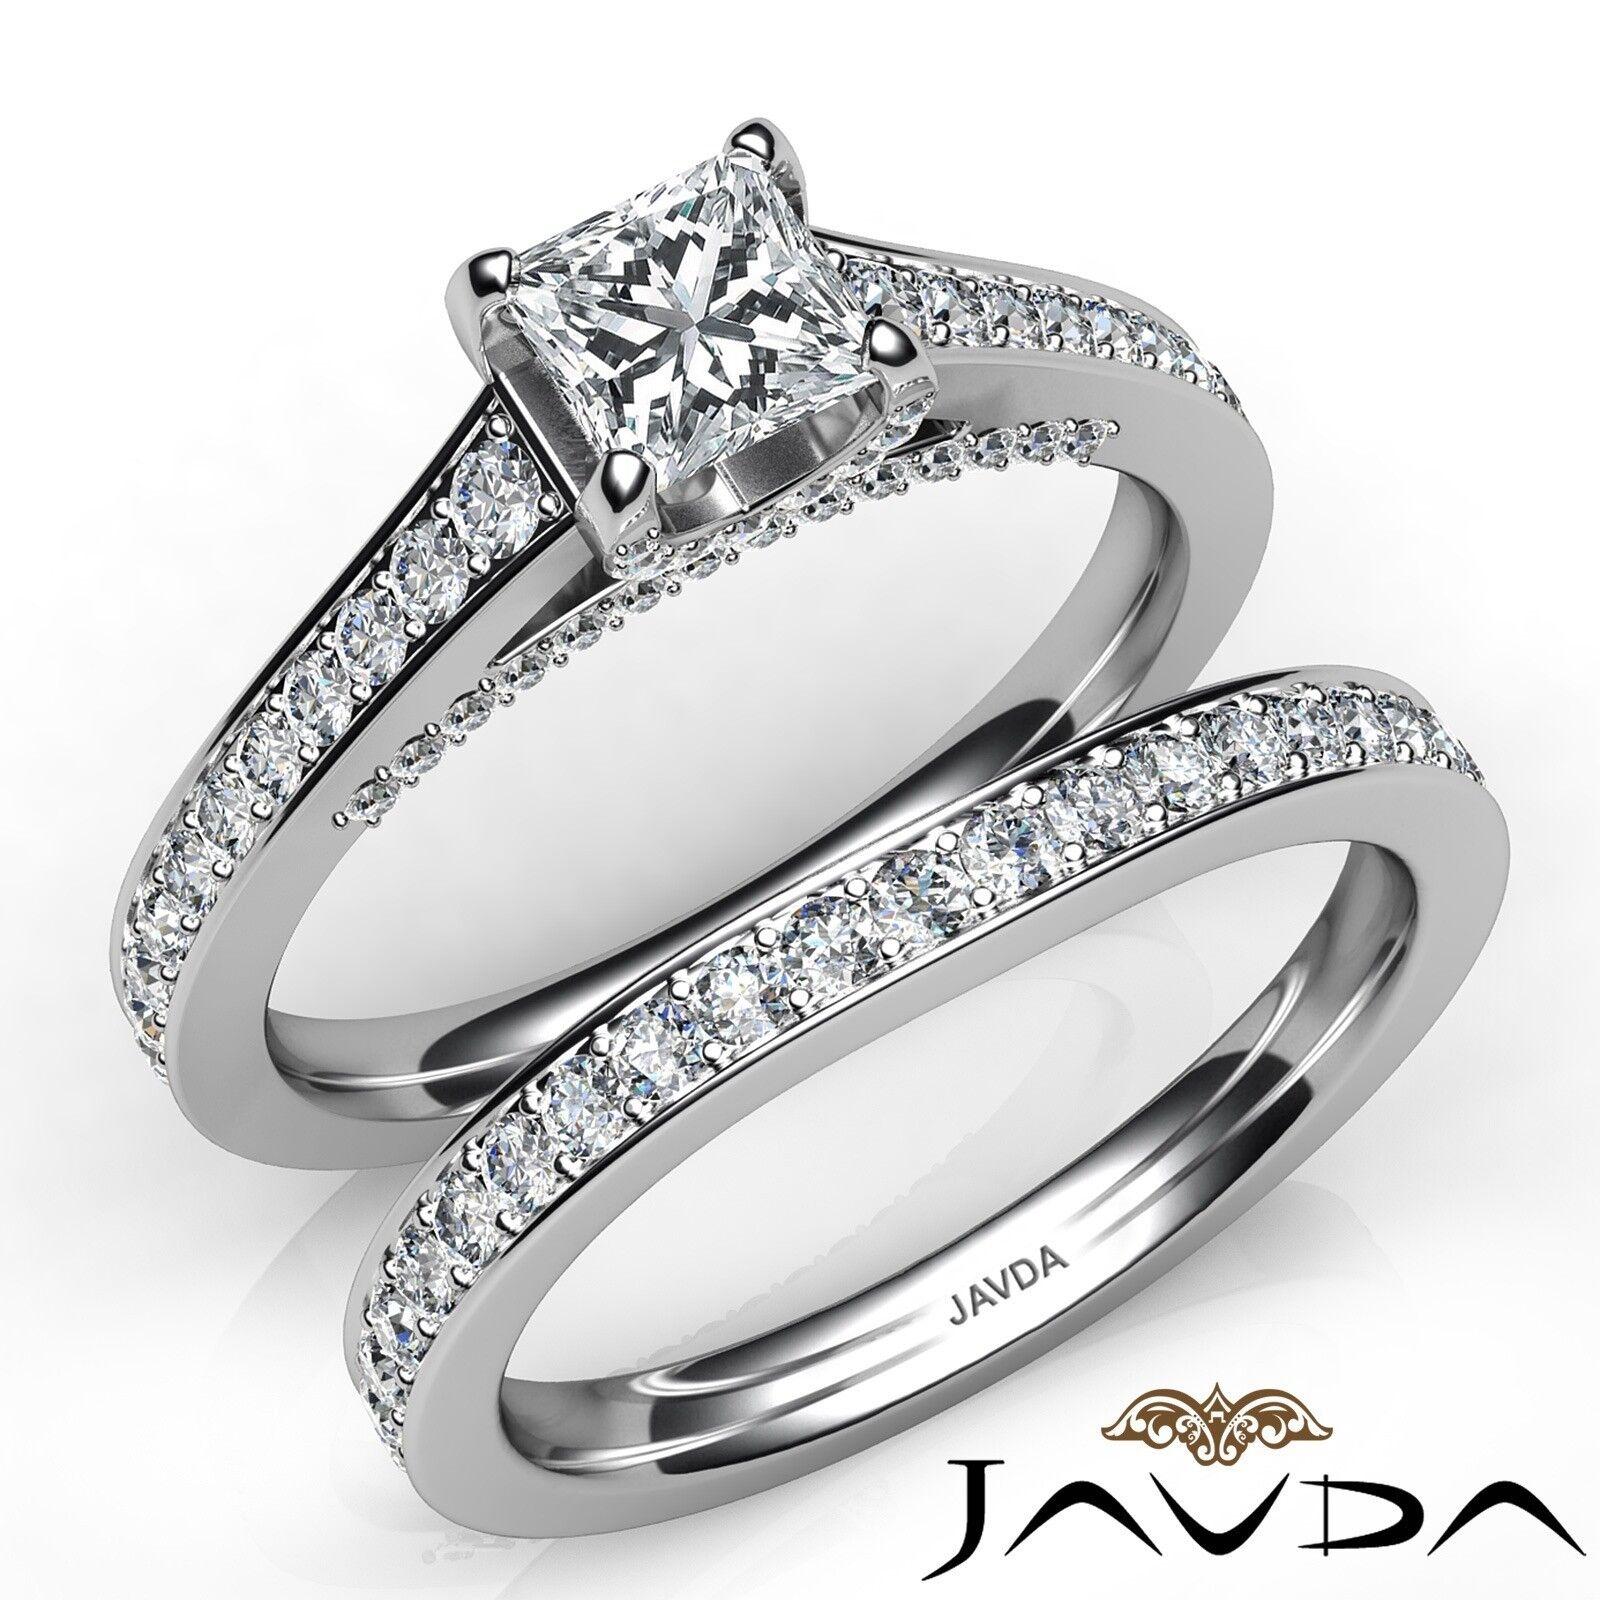 1.75ctw Accent Bridge Pave Bridal Princess Diamond Engagement Ring GIA E-VVS2